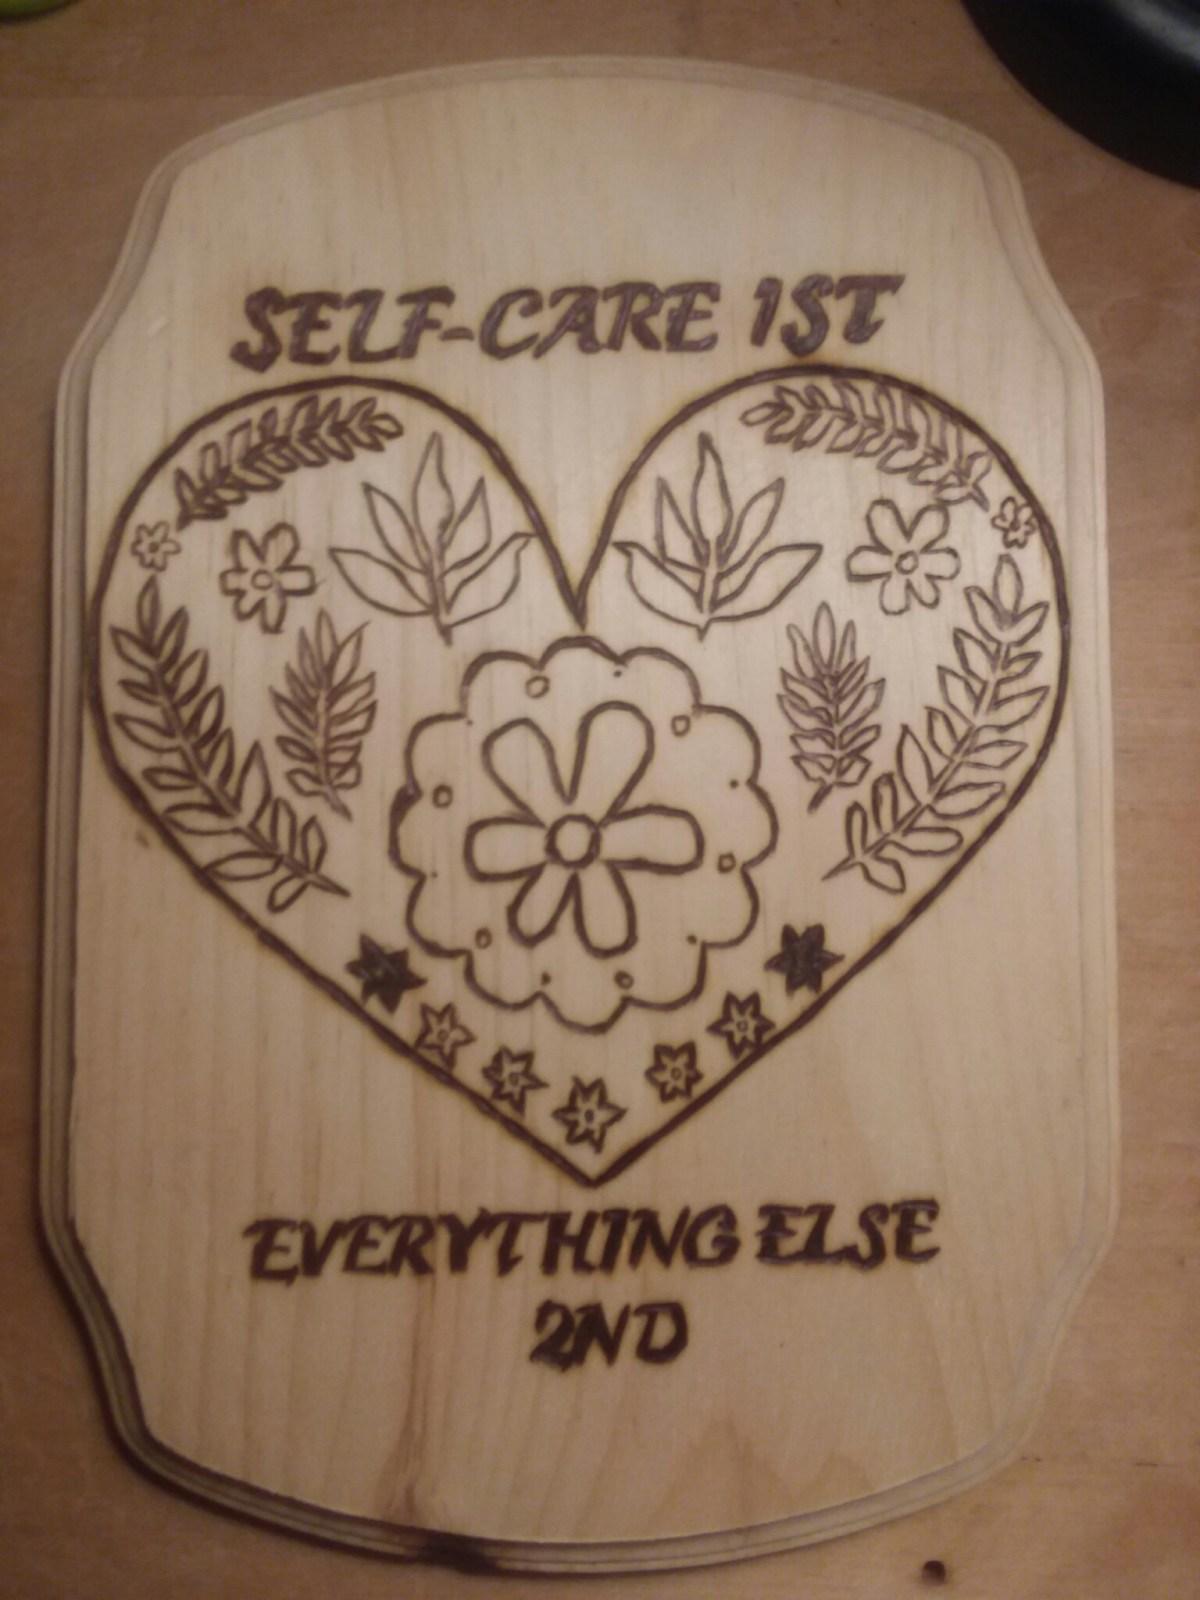 Self-Care wood burnt plaque 9.9.19